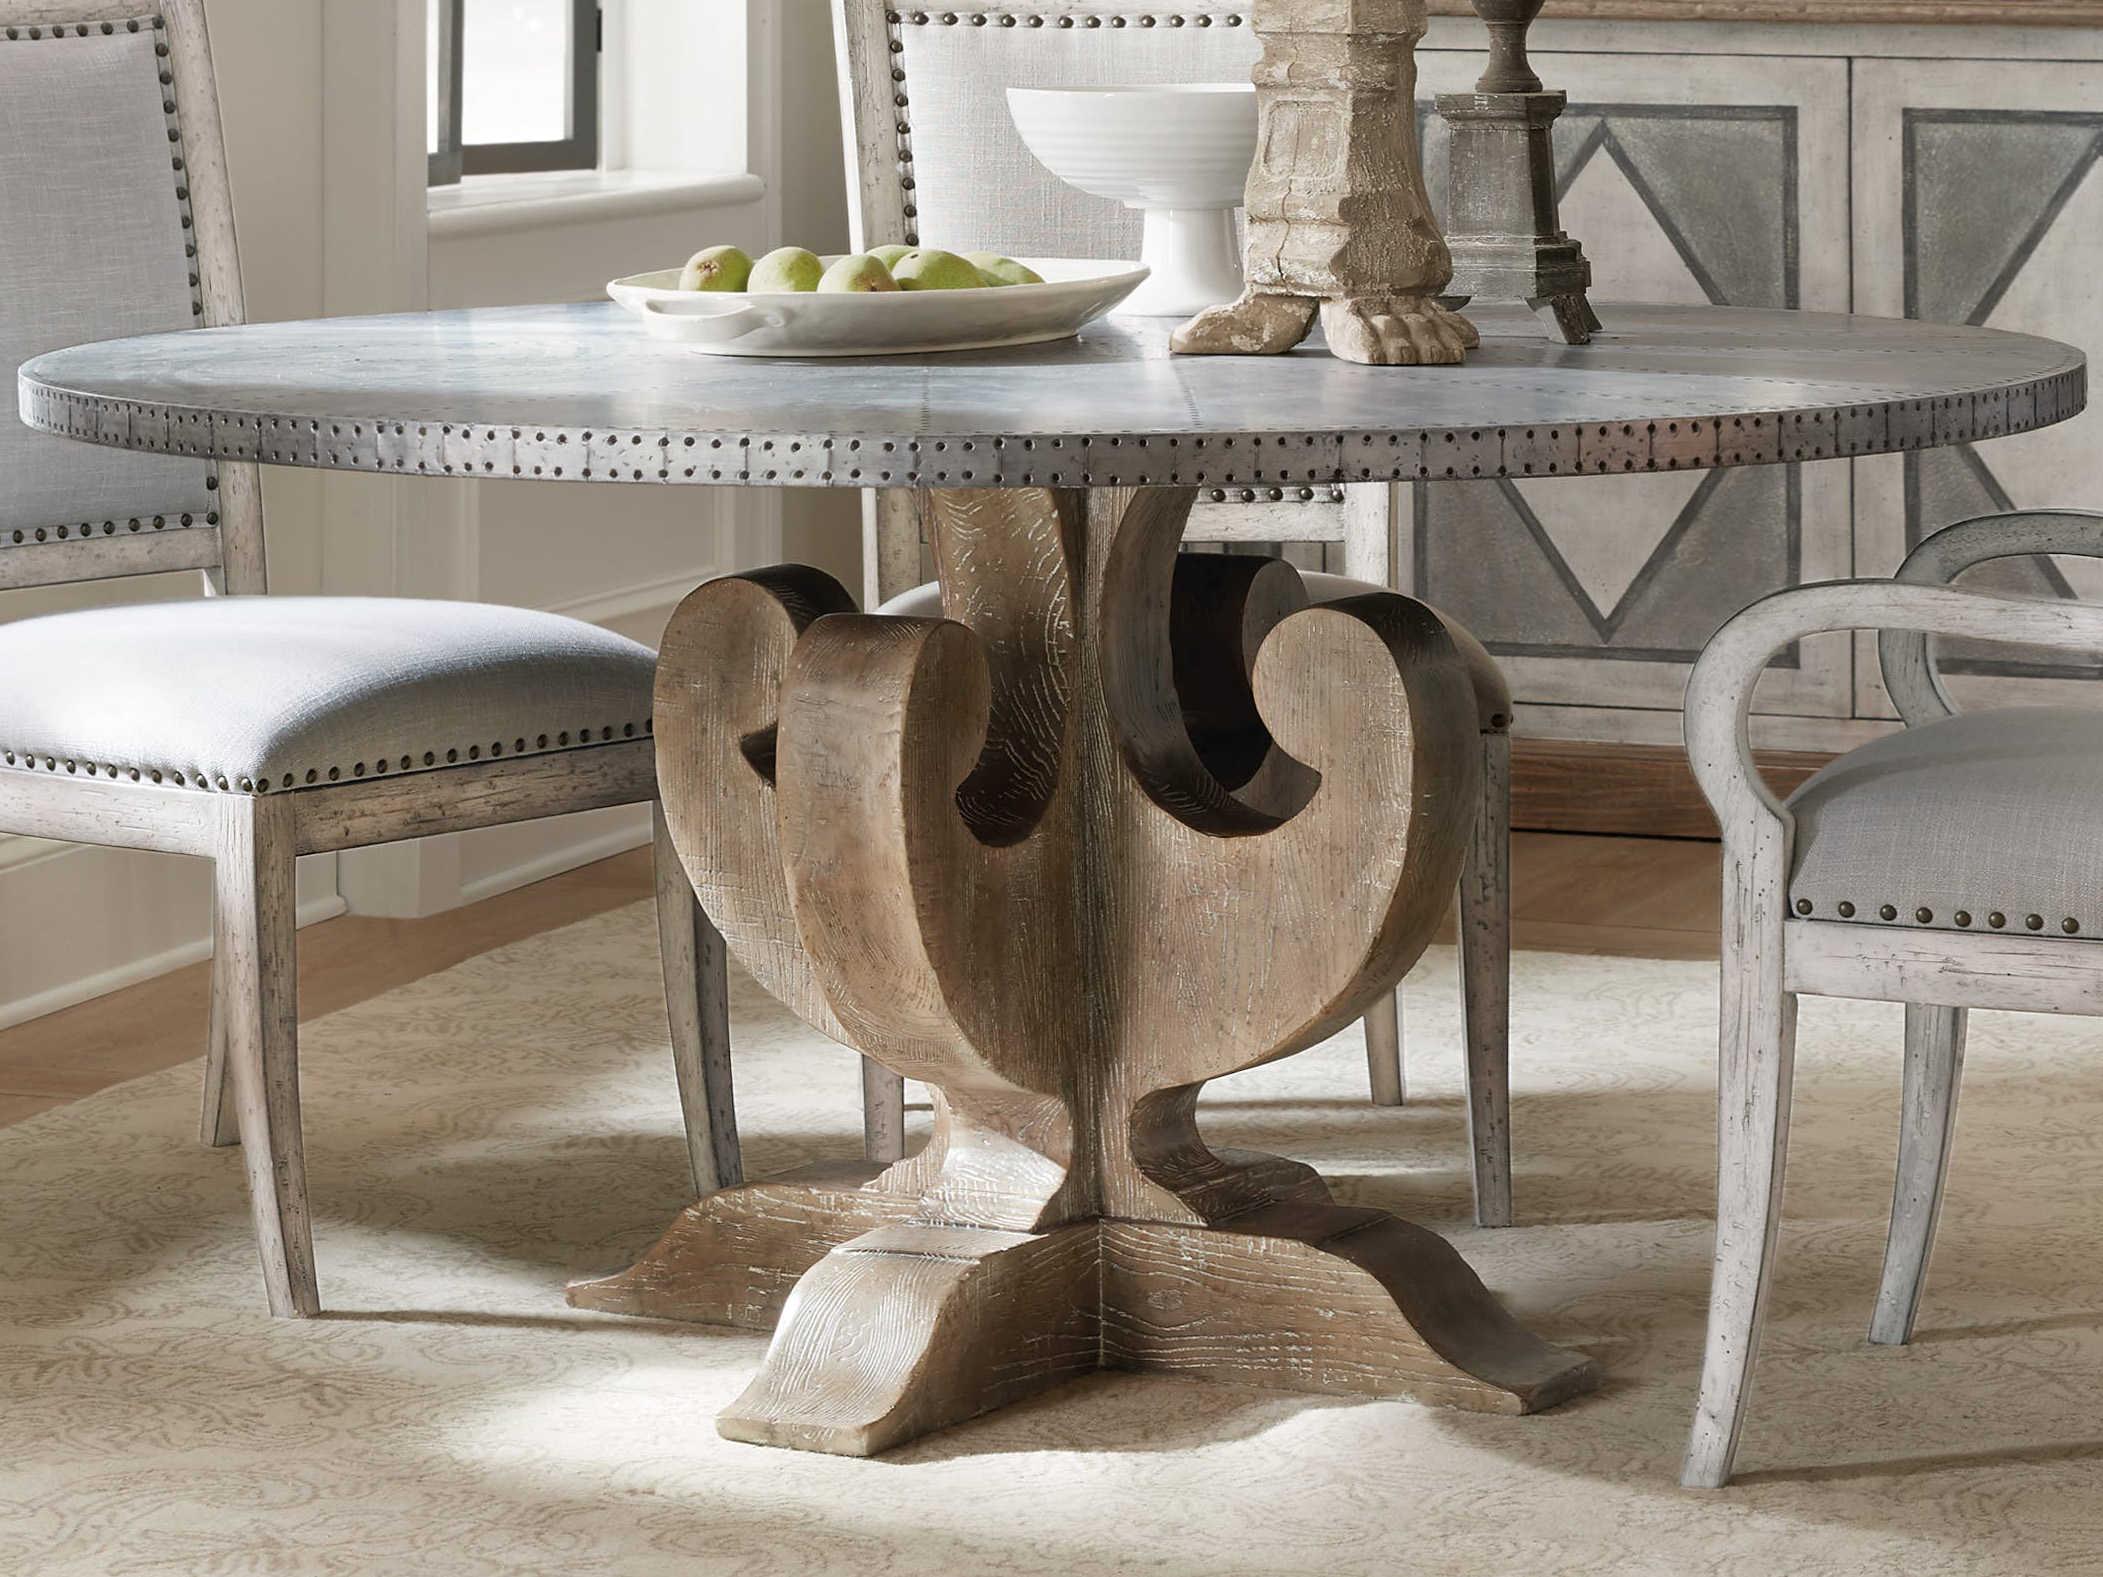 Hooker Furniture Boheme Zinc Light Wood 60 Wide Round Dining Table Hoo575075213slv